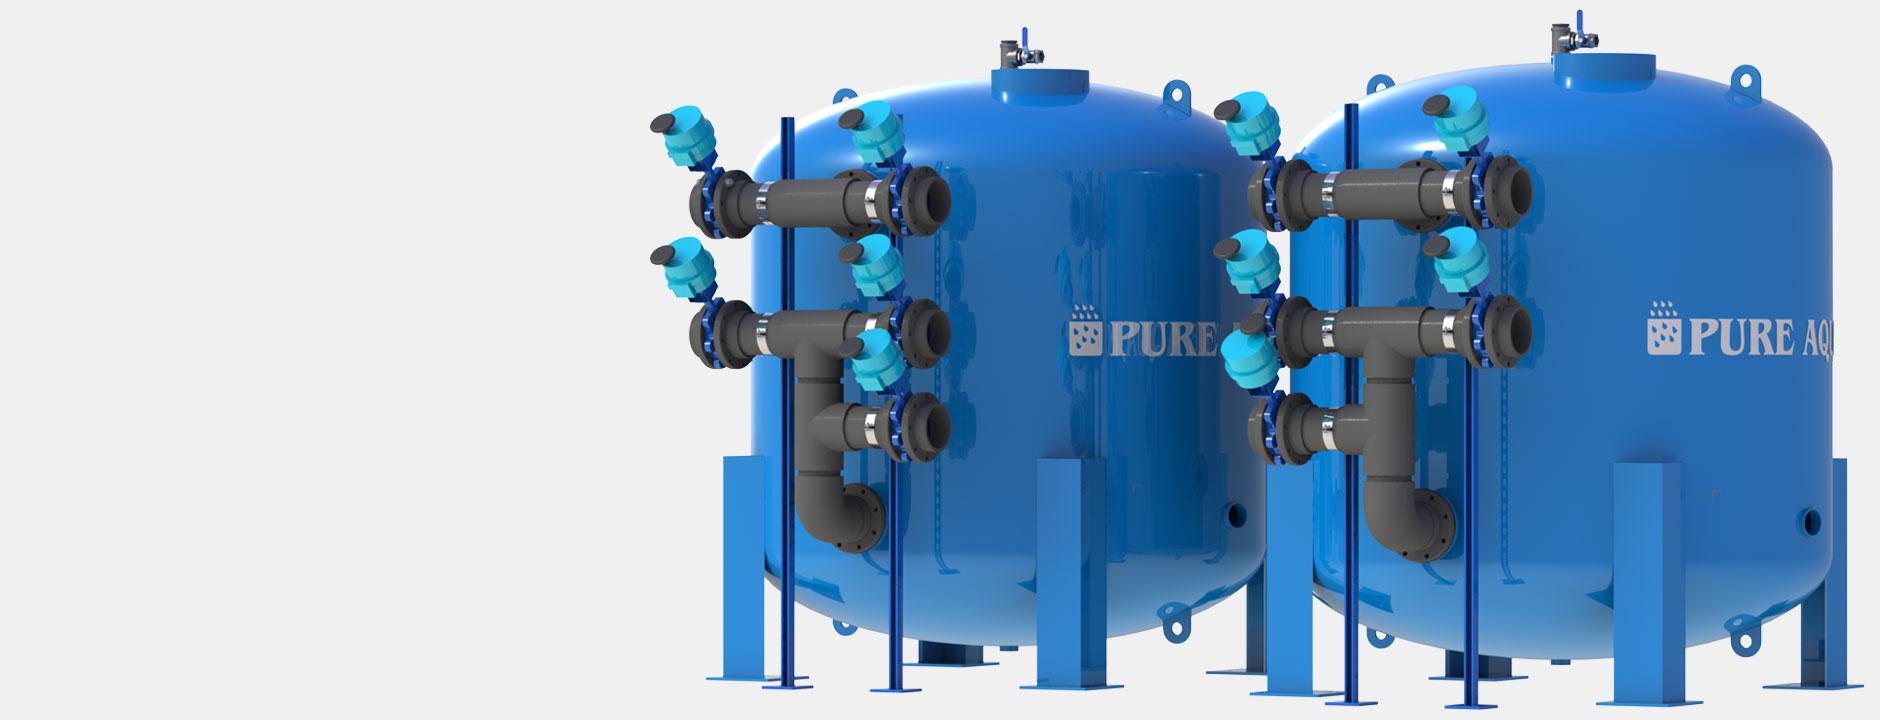 water media filters systems أنظمة تنقية المياه الصناعية و التجارية